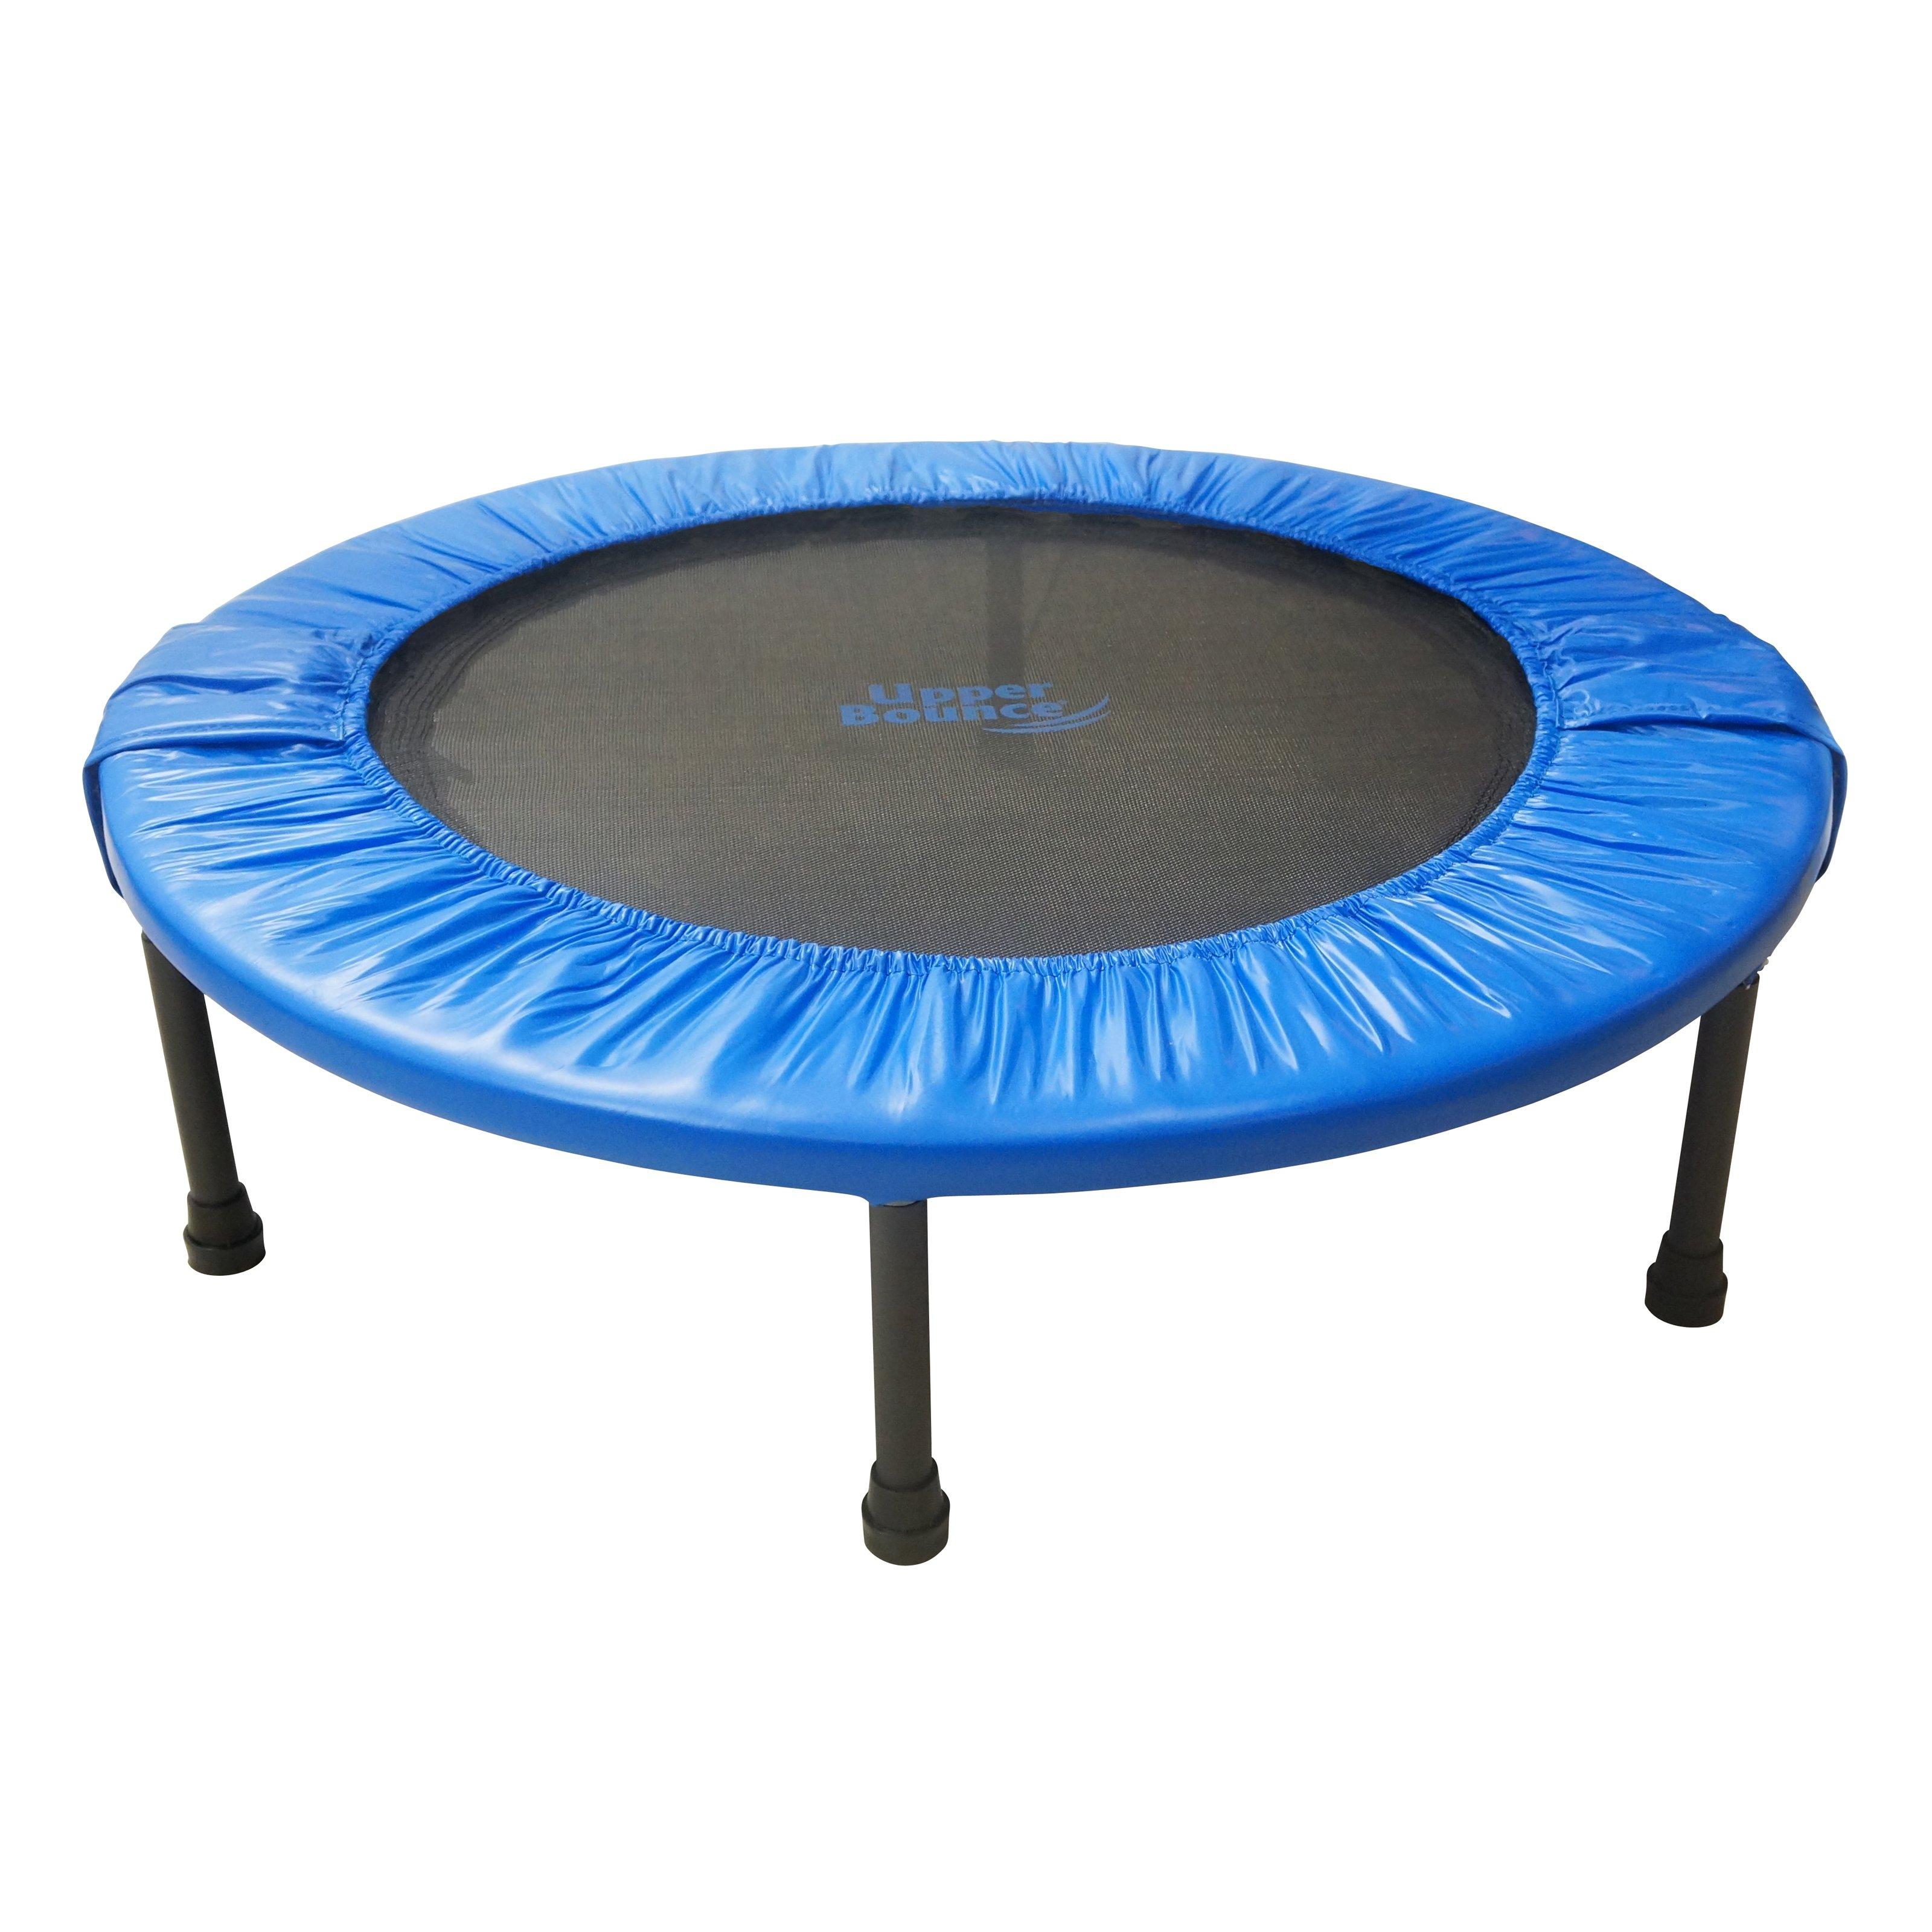 Upper Bounce 36 in. Mini Foldable Rebounder Fitness Trampoline